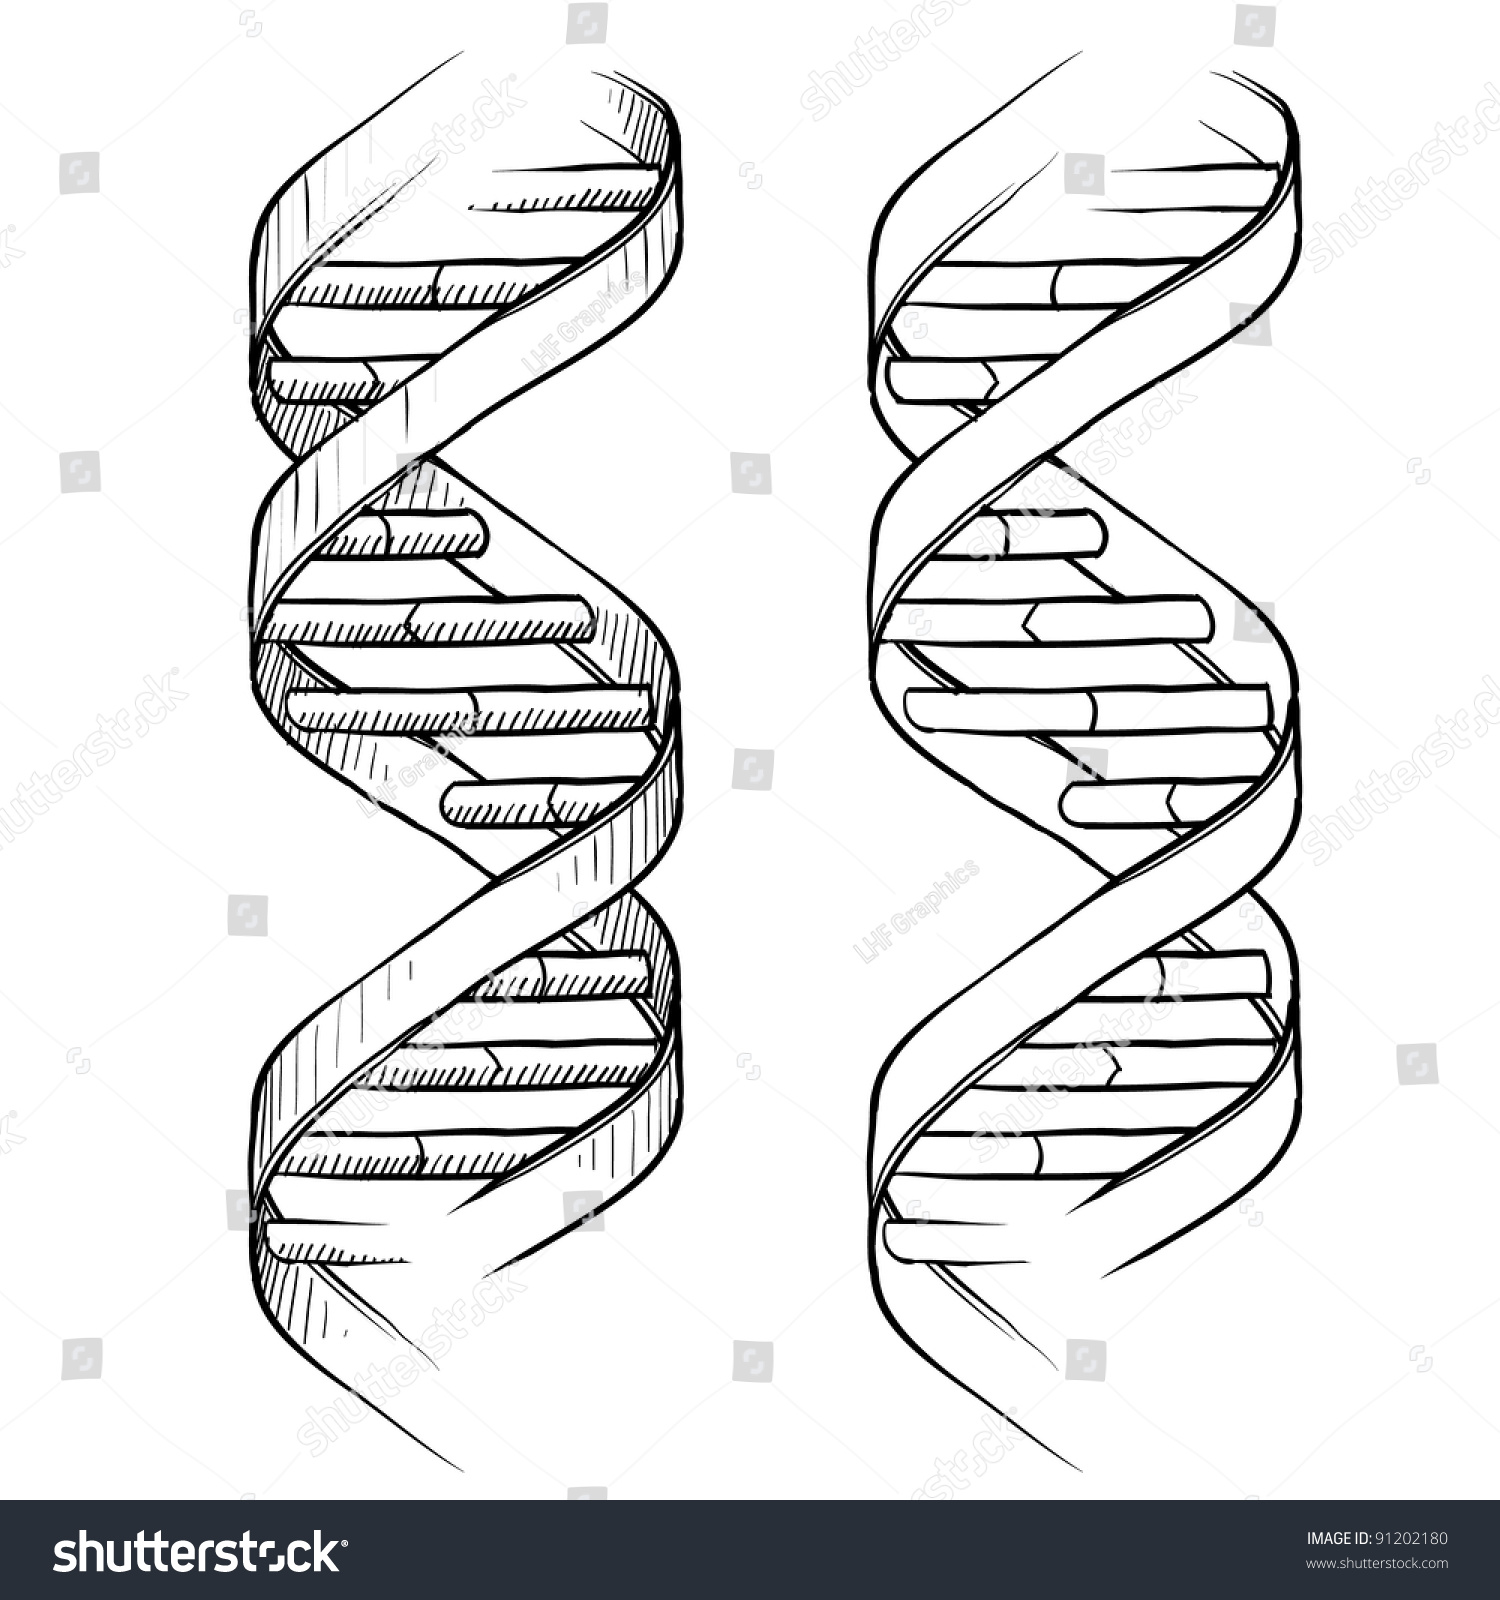 Doodle Style Genetic Dna Double Helix Stock Vector